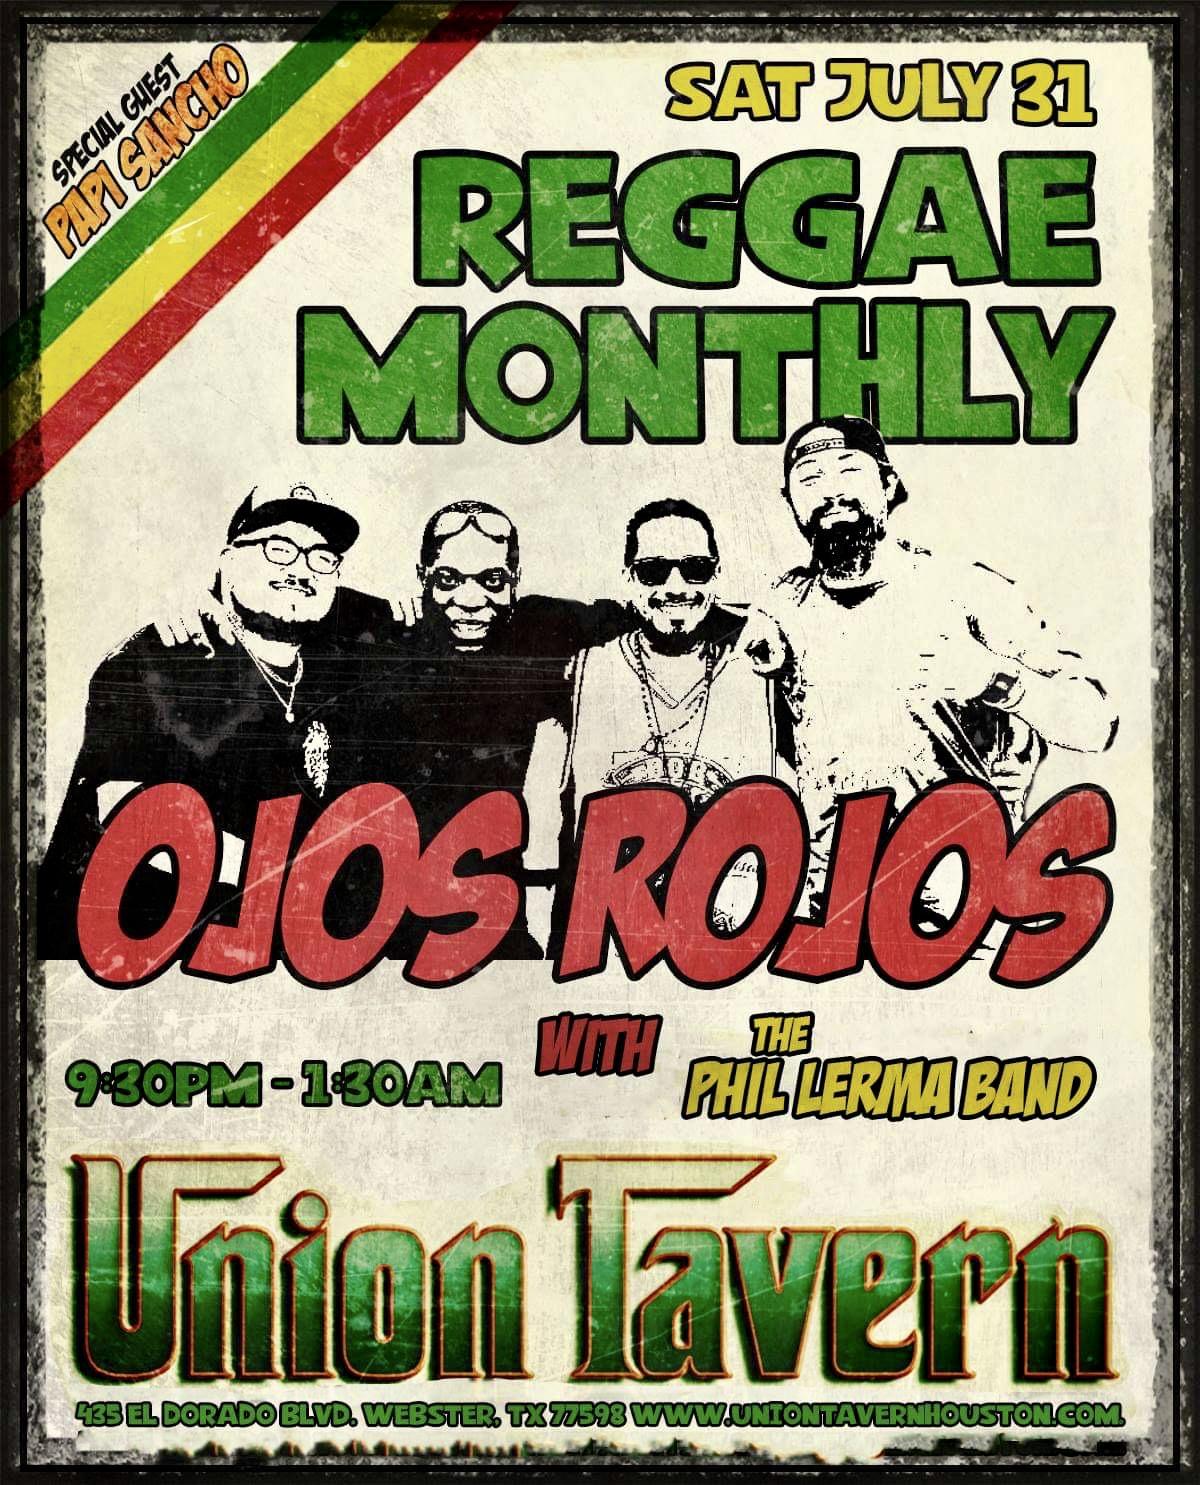 Ojos Rojos, Phil Lerma Band, & Papi Sancho @ Union Tavern 7/31